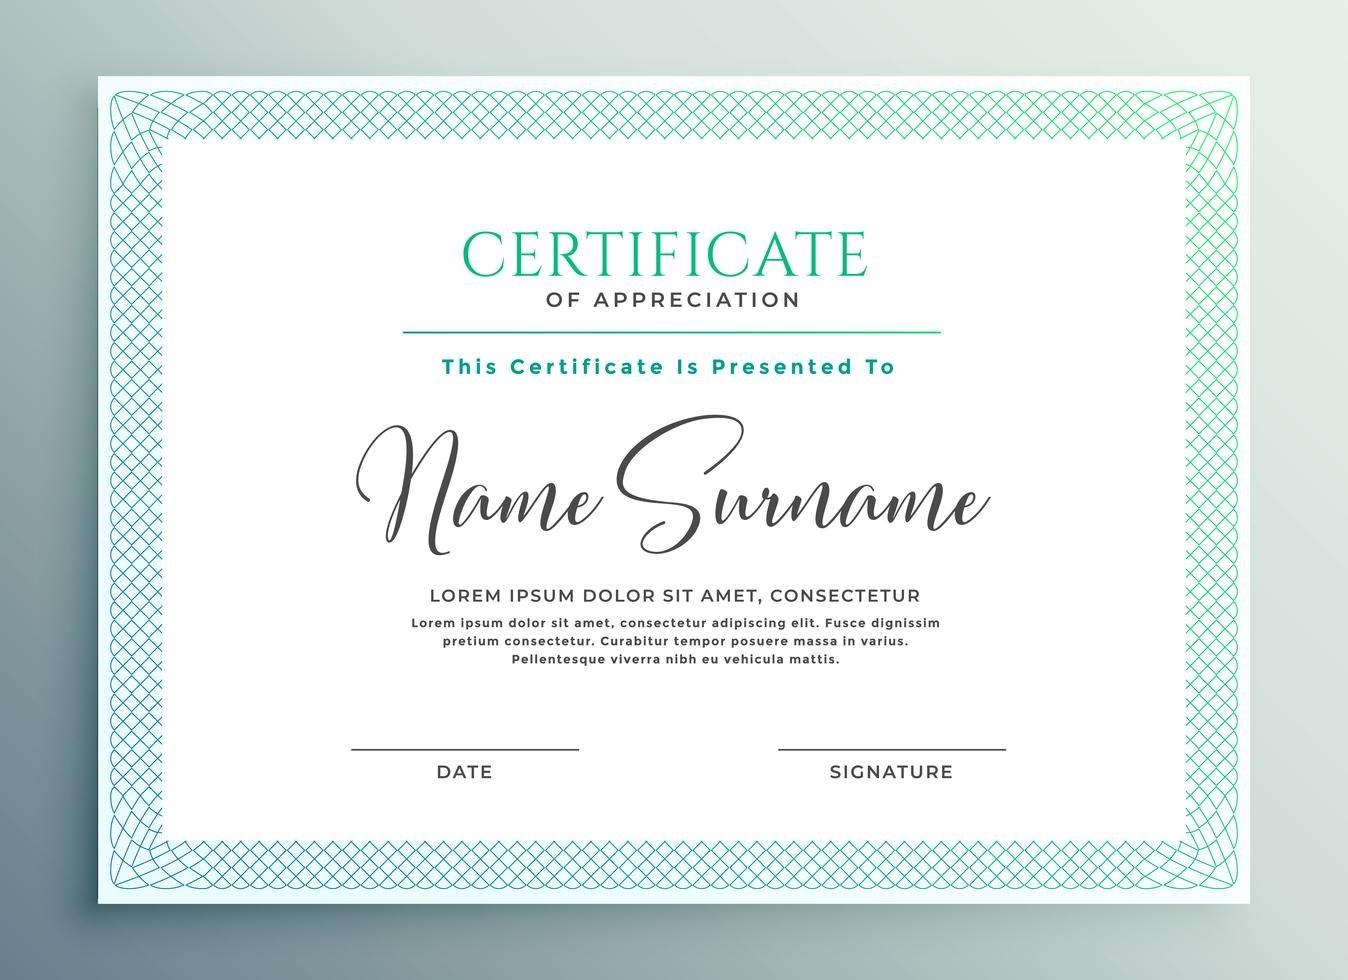 Certificate Of Appreciation Template Download  Templates Study Intended For Certificate Of Appreciation Template Doc